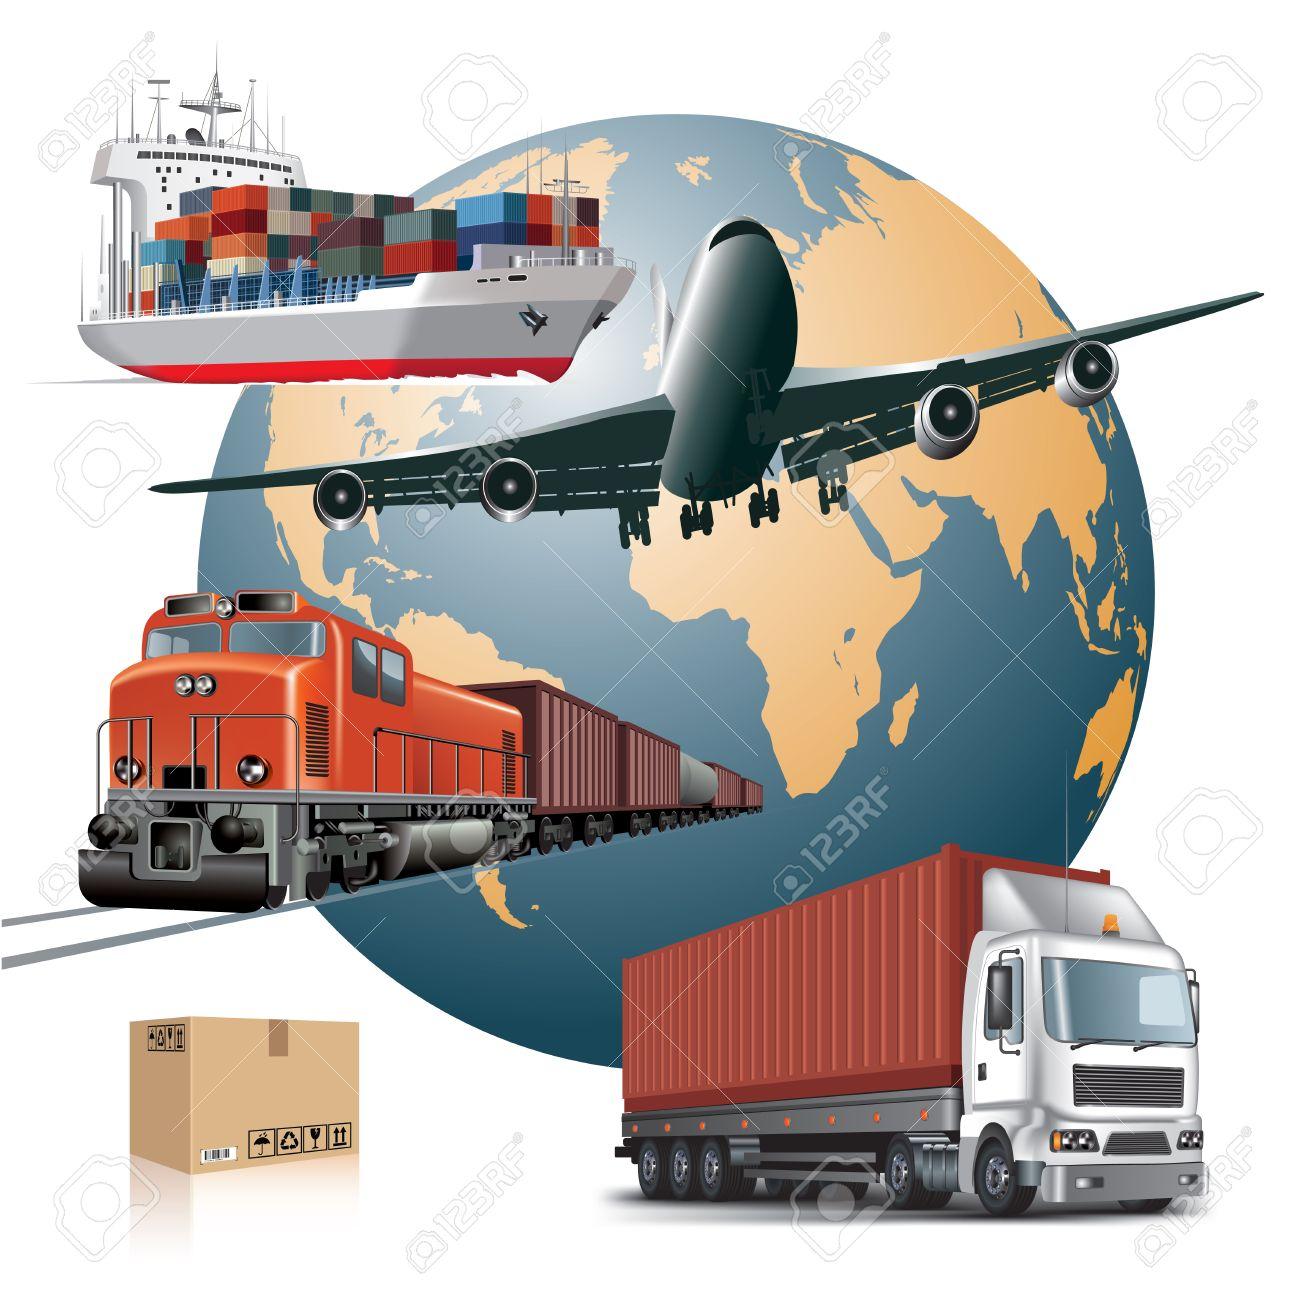 World wide cargo transport concept Vector illustration - 29457885